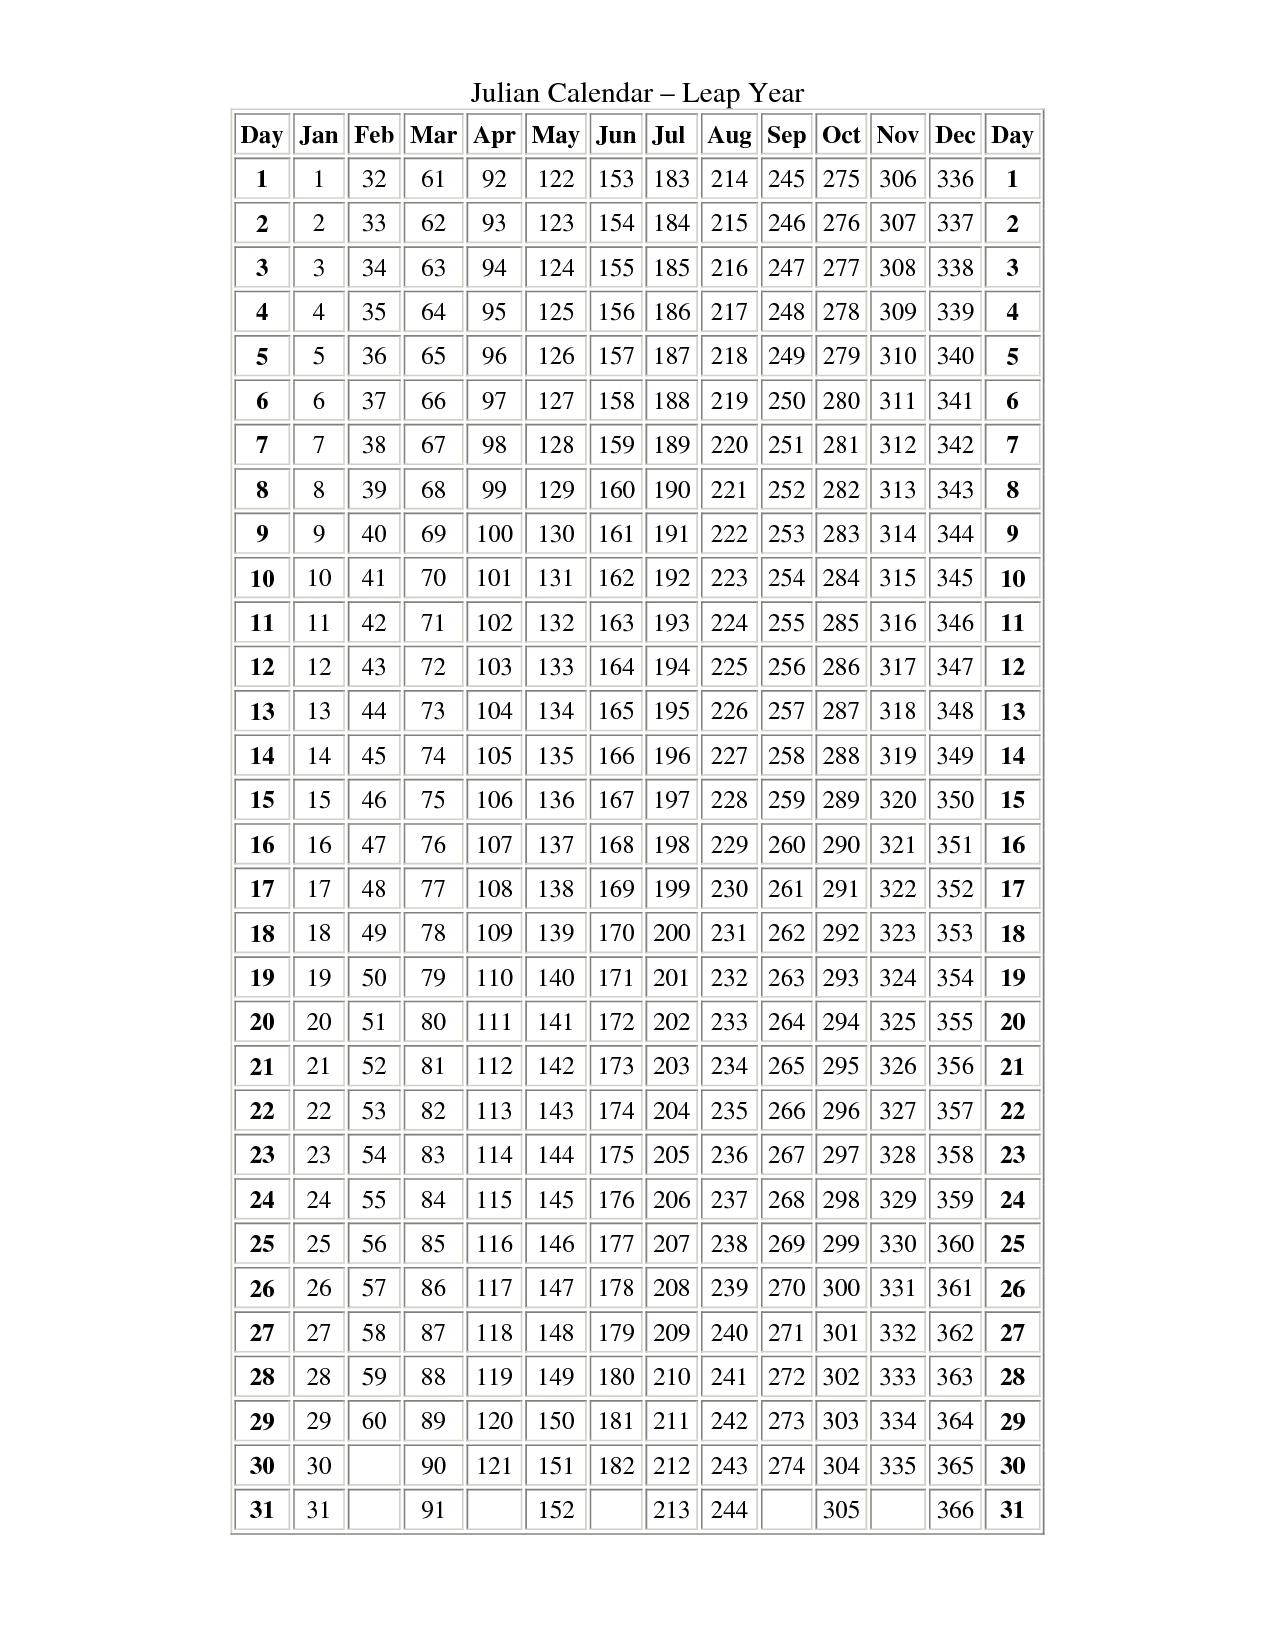 Julian Date Calendar For Non Leap Year | Template Calendar Printable